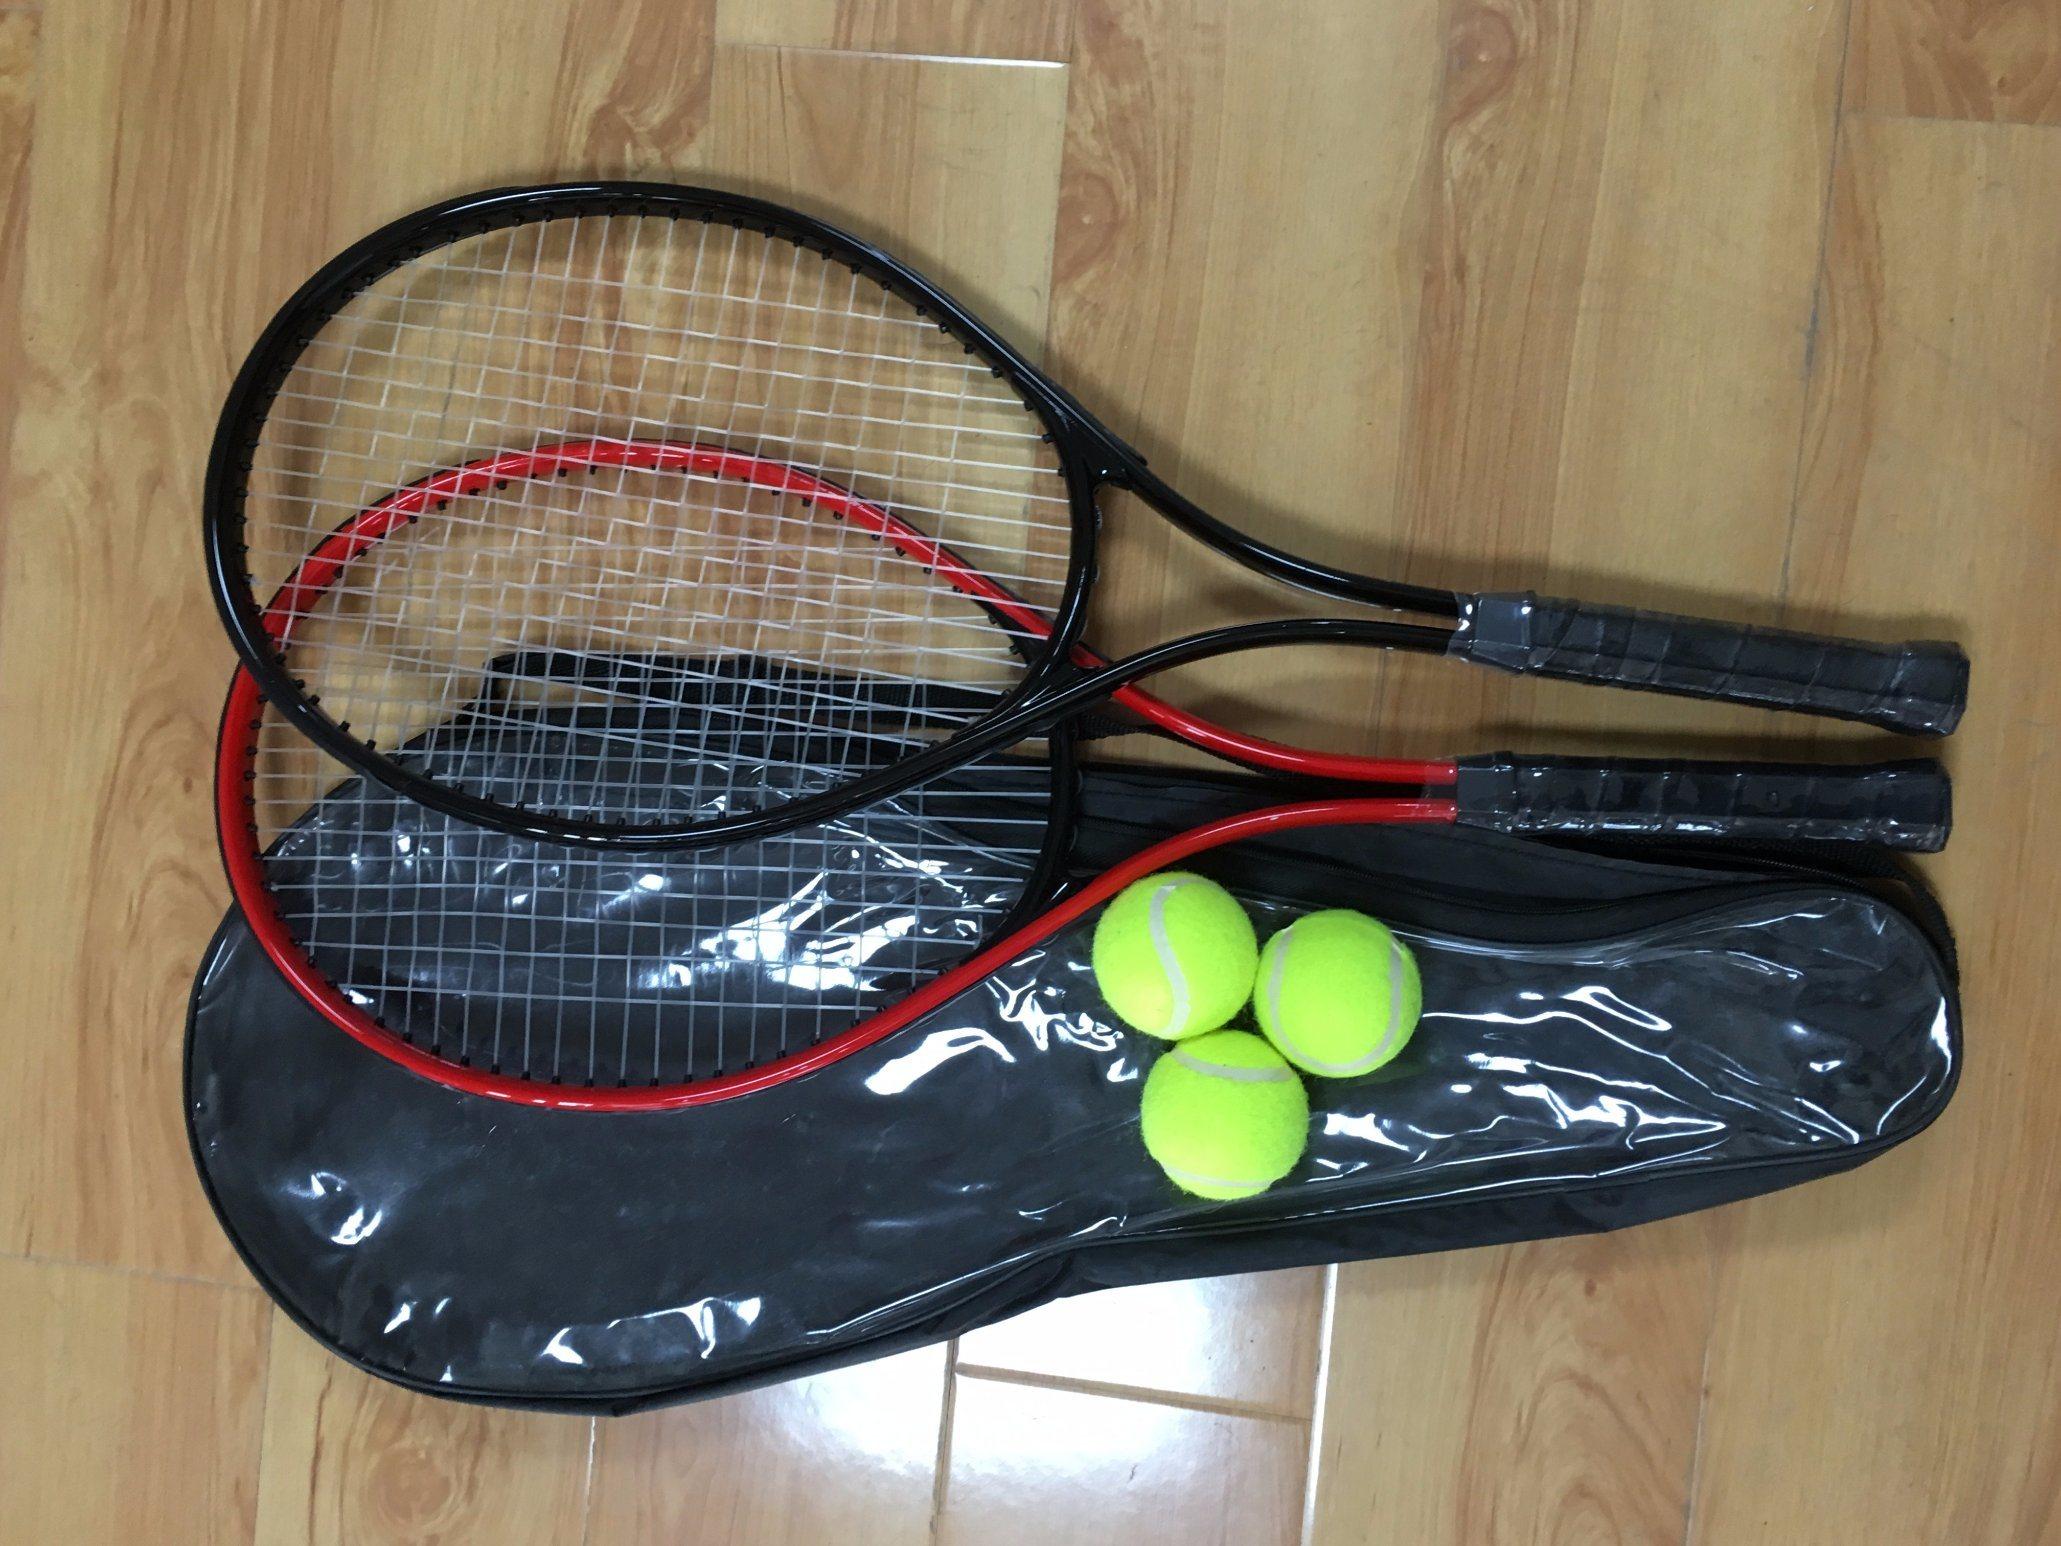 Cheapest 2PCS Tennis Racket Combo